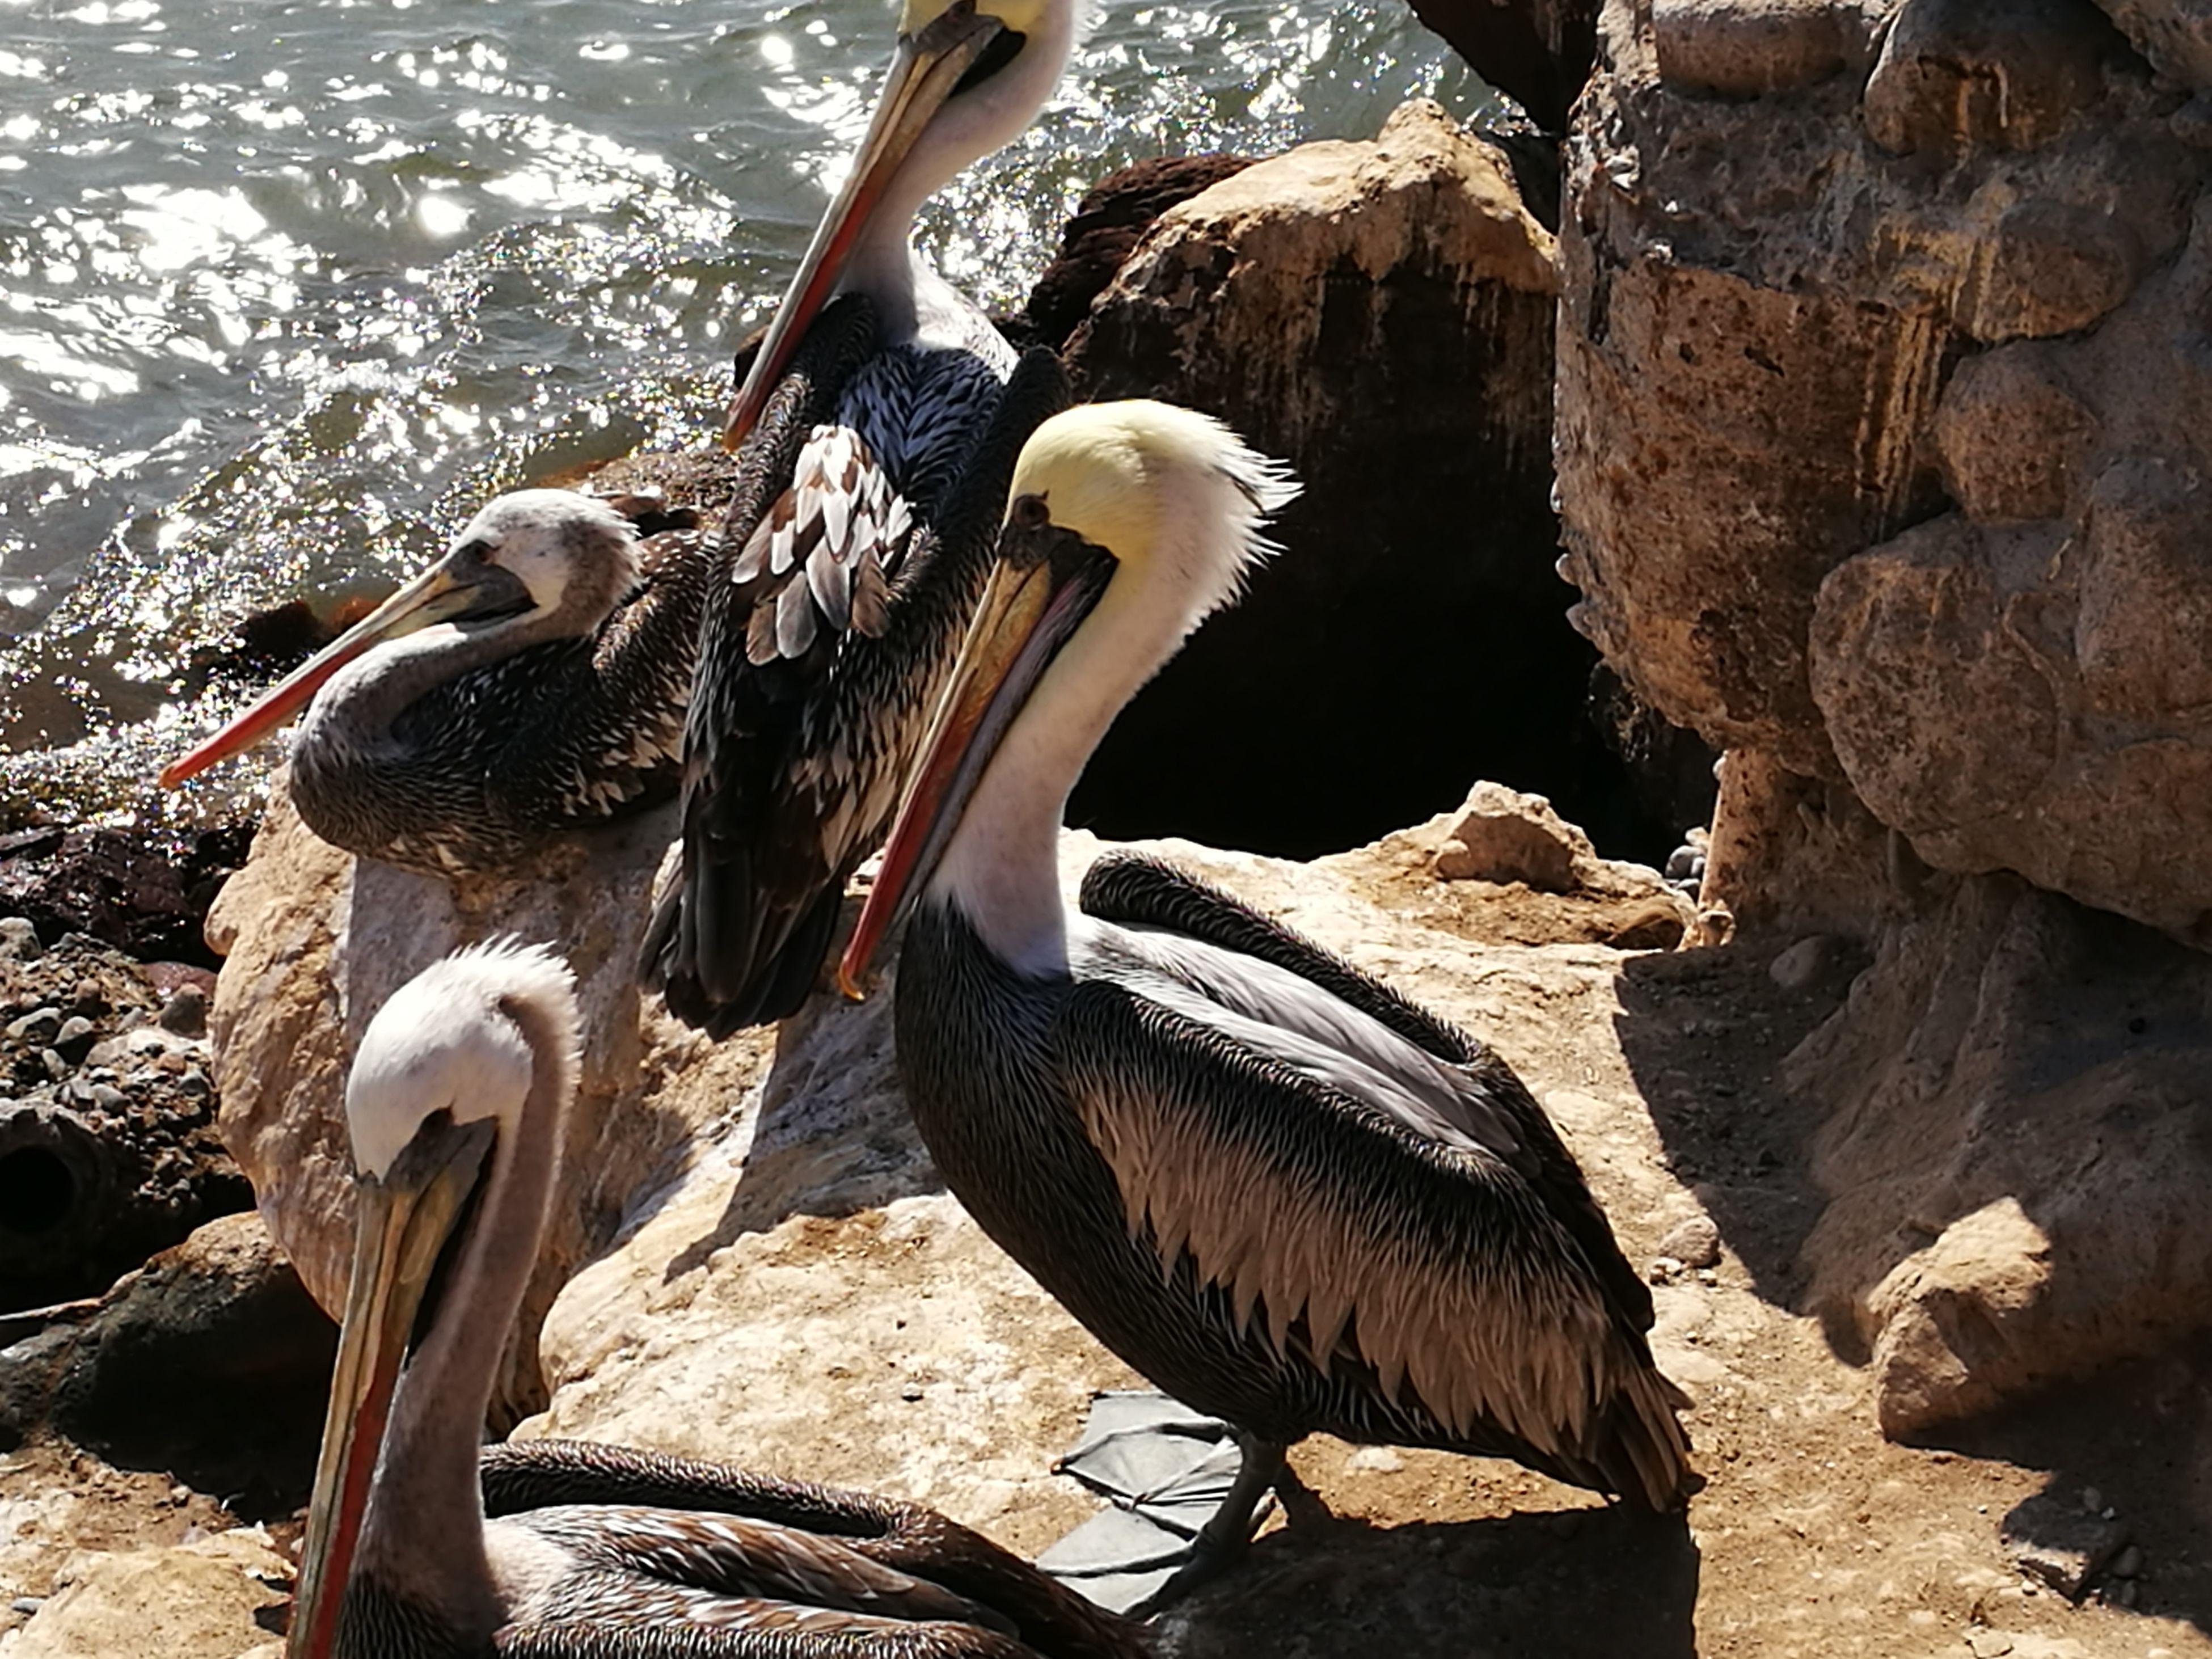 animal themes, bird, animals in the wild, wildlife, zoology, one animal, pelican, tree trunk, beak, animal, nature, water bird, day, outdoors, animal behavior, riverbank